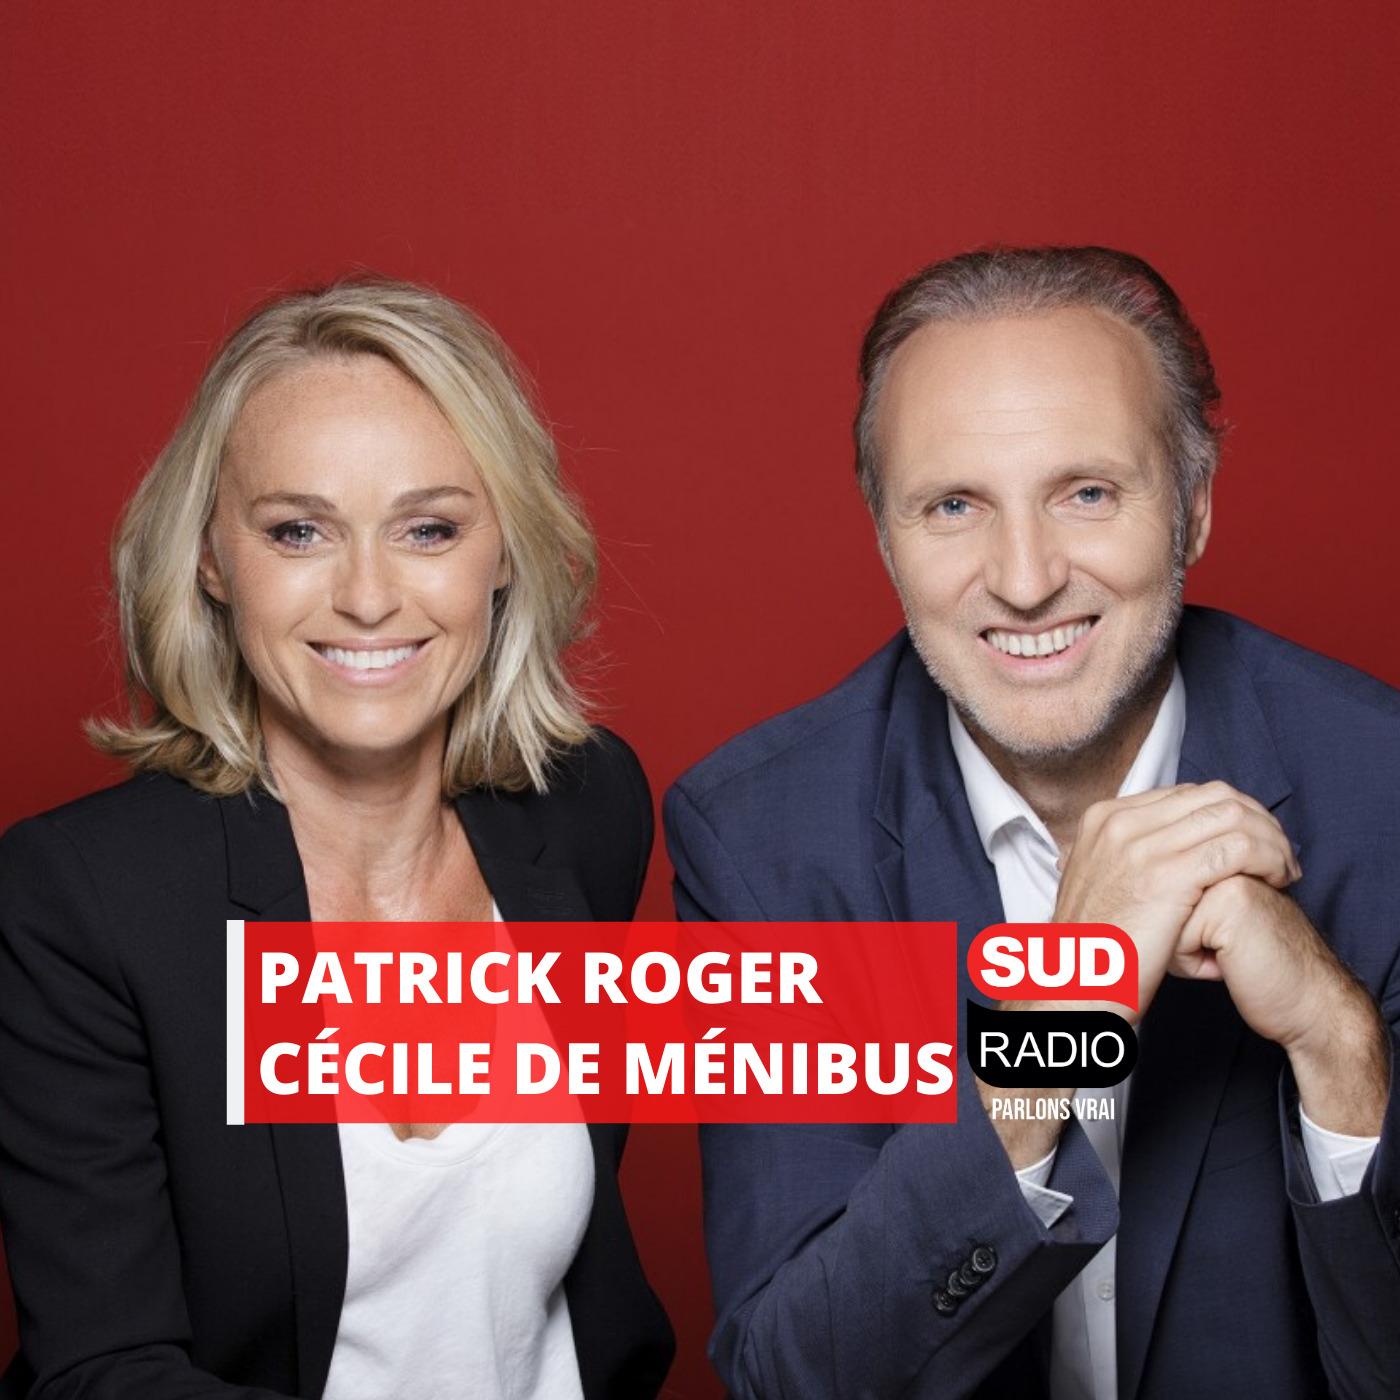 Image 1: Le petit dejeuner politique Sud Radio